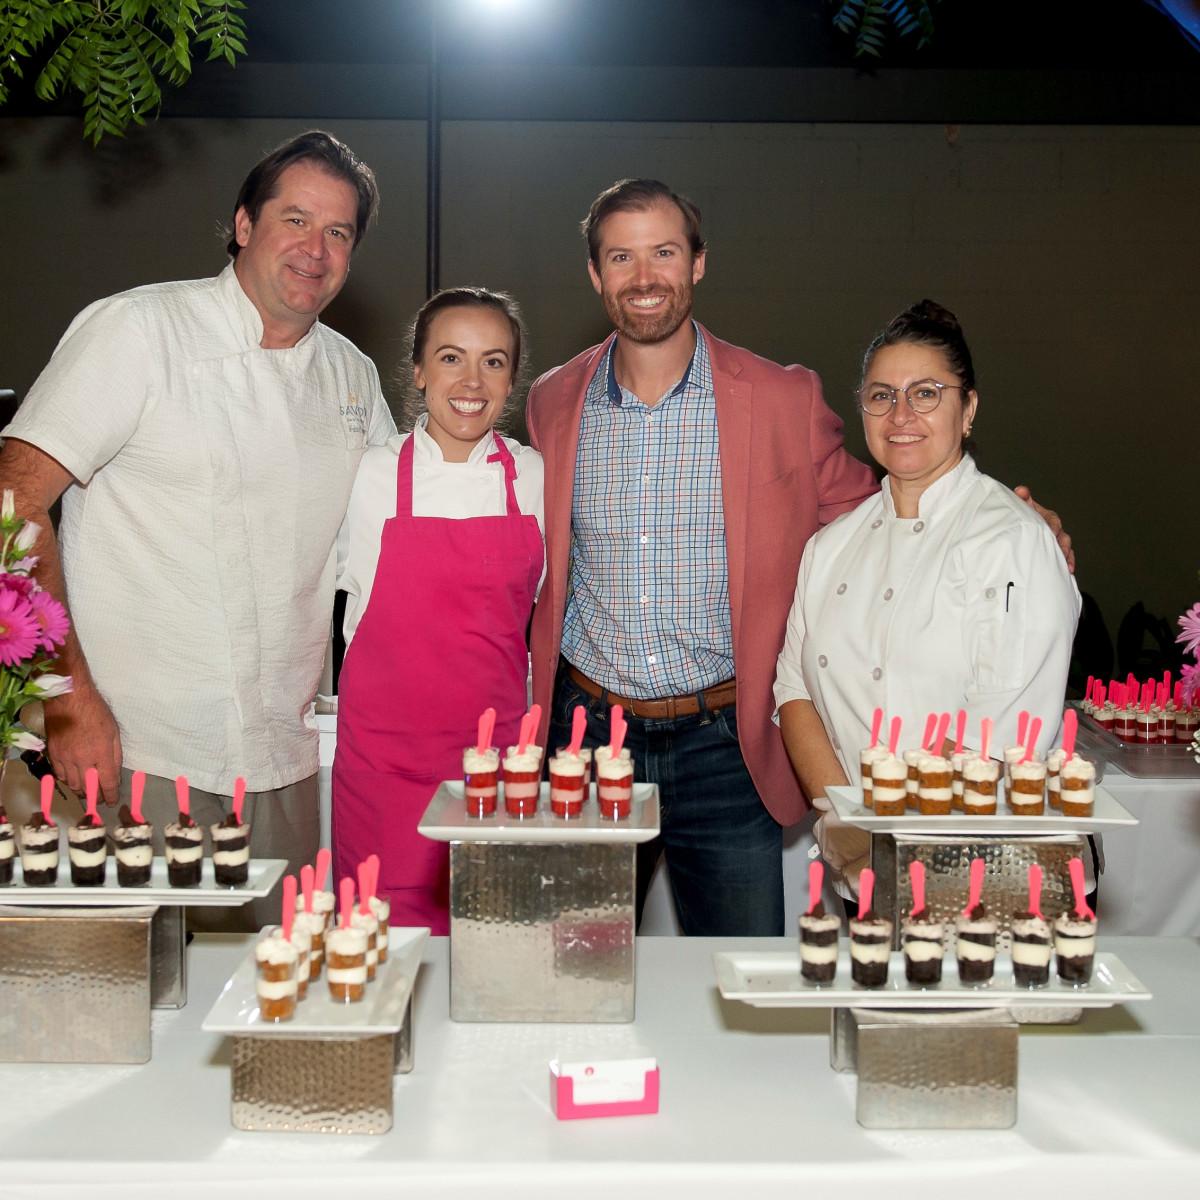 Chef John Coleman of Savor Gastropub, Julie Vorce of Pink Apron Pastry, and staff, Park & Palate